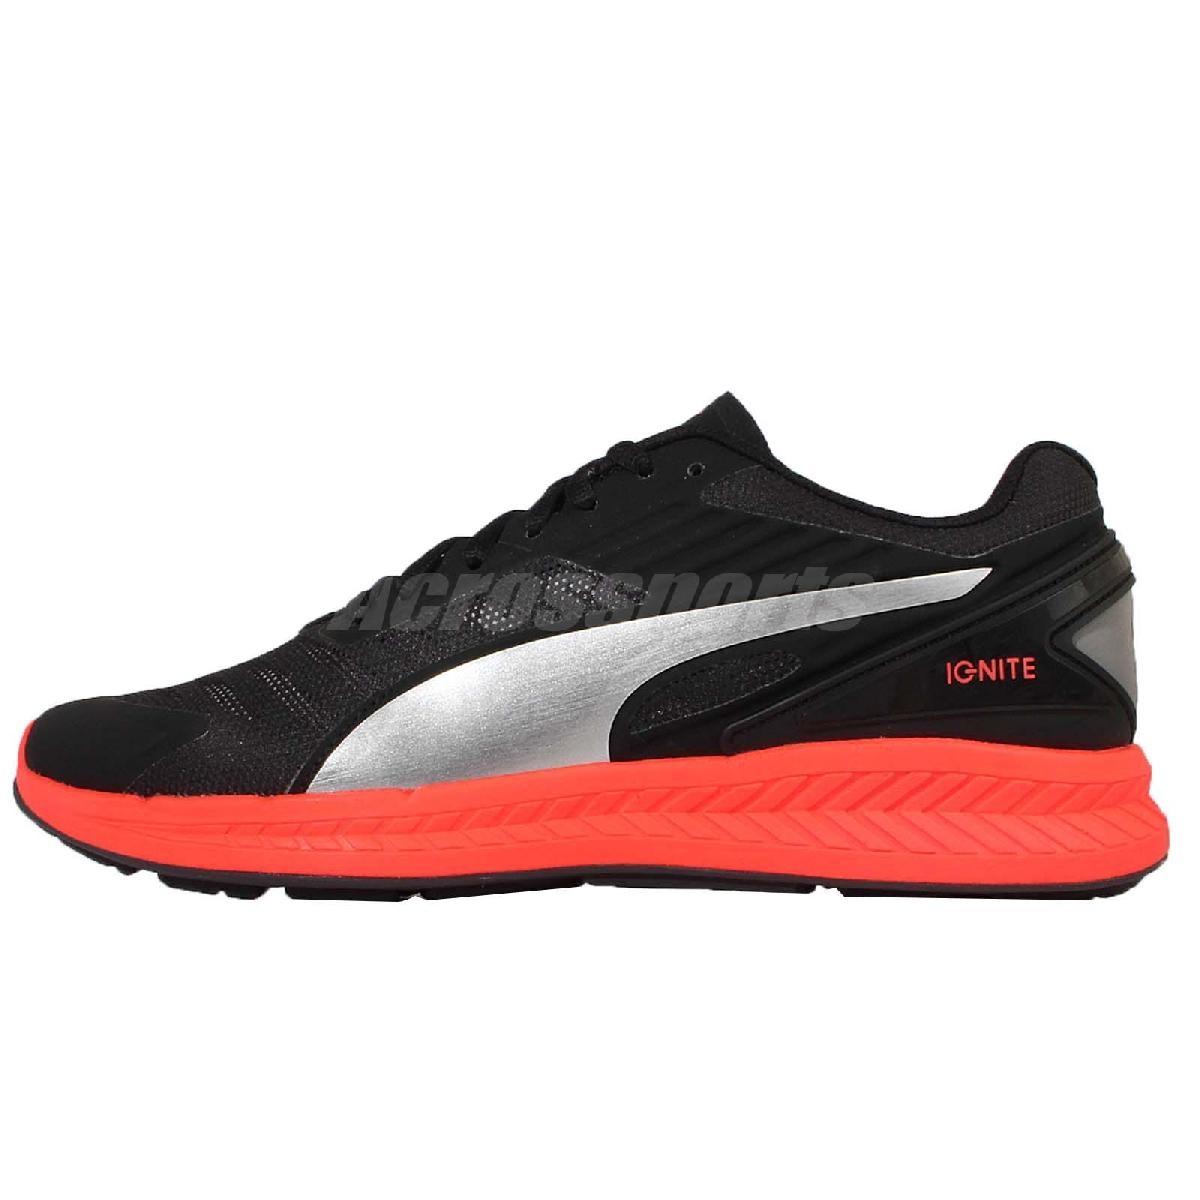 Puma 慢跑鞋 Ignite V2 Mesh鞋面 透氣 低筒 路跑 跑鞋 黑橘 男鞋【PUMP306】 18861102